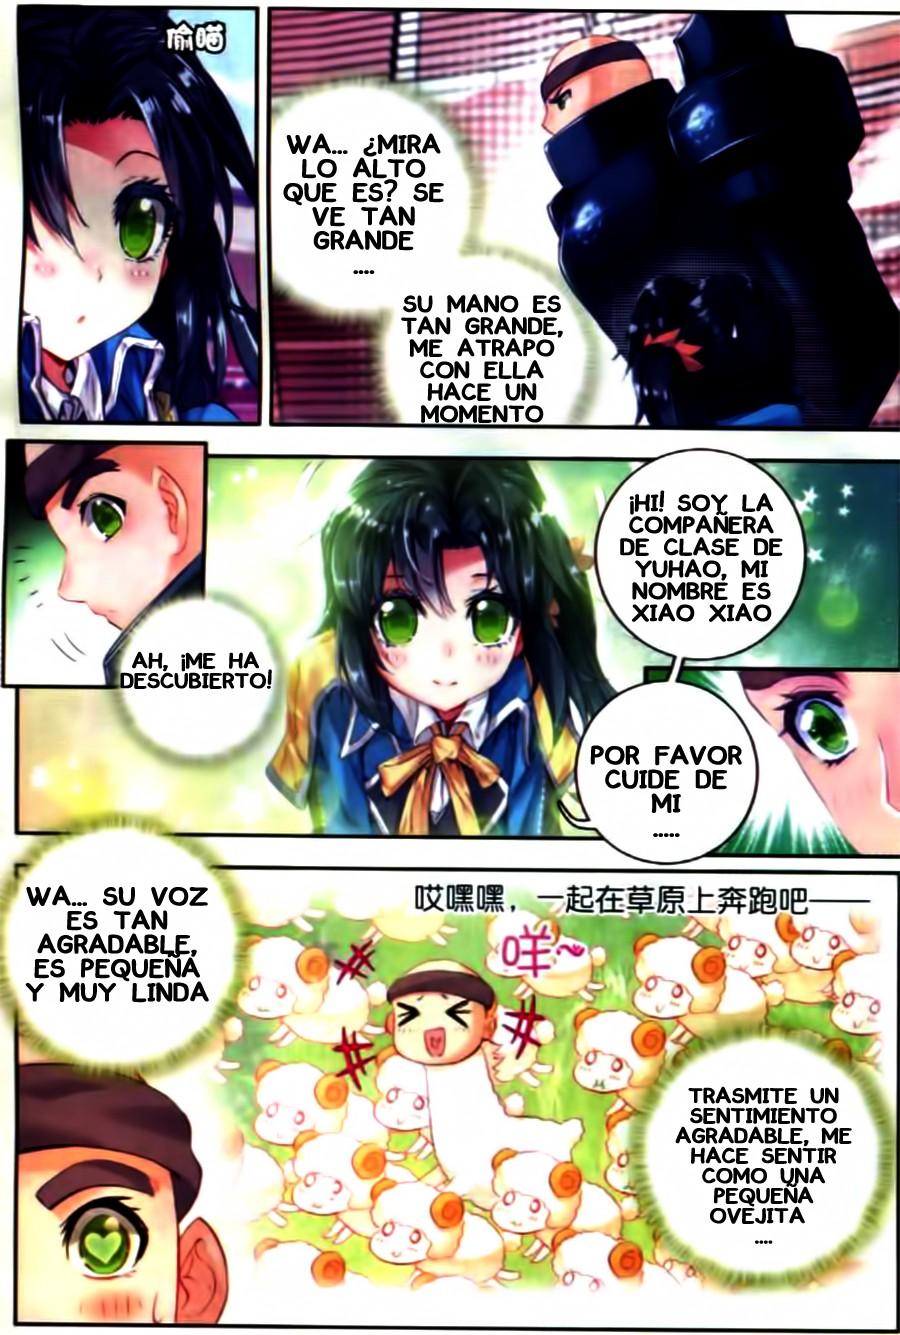 http://c5.ninemanga.com/es_manga/33/16417/435102/b38a6368684fa123889595bbee41a4fe.jpg Page 7